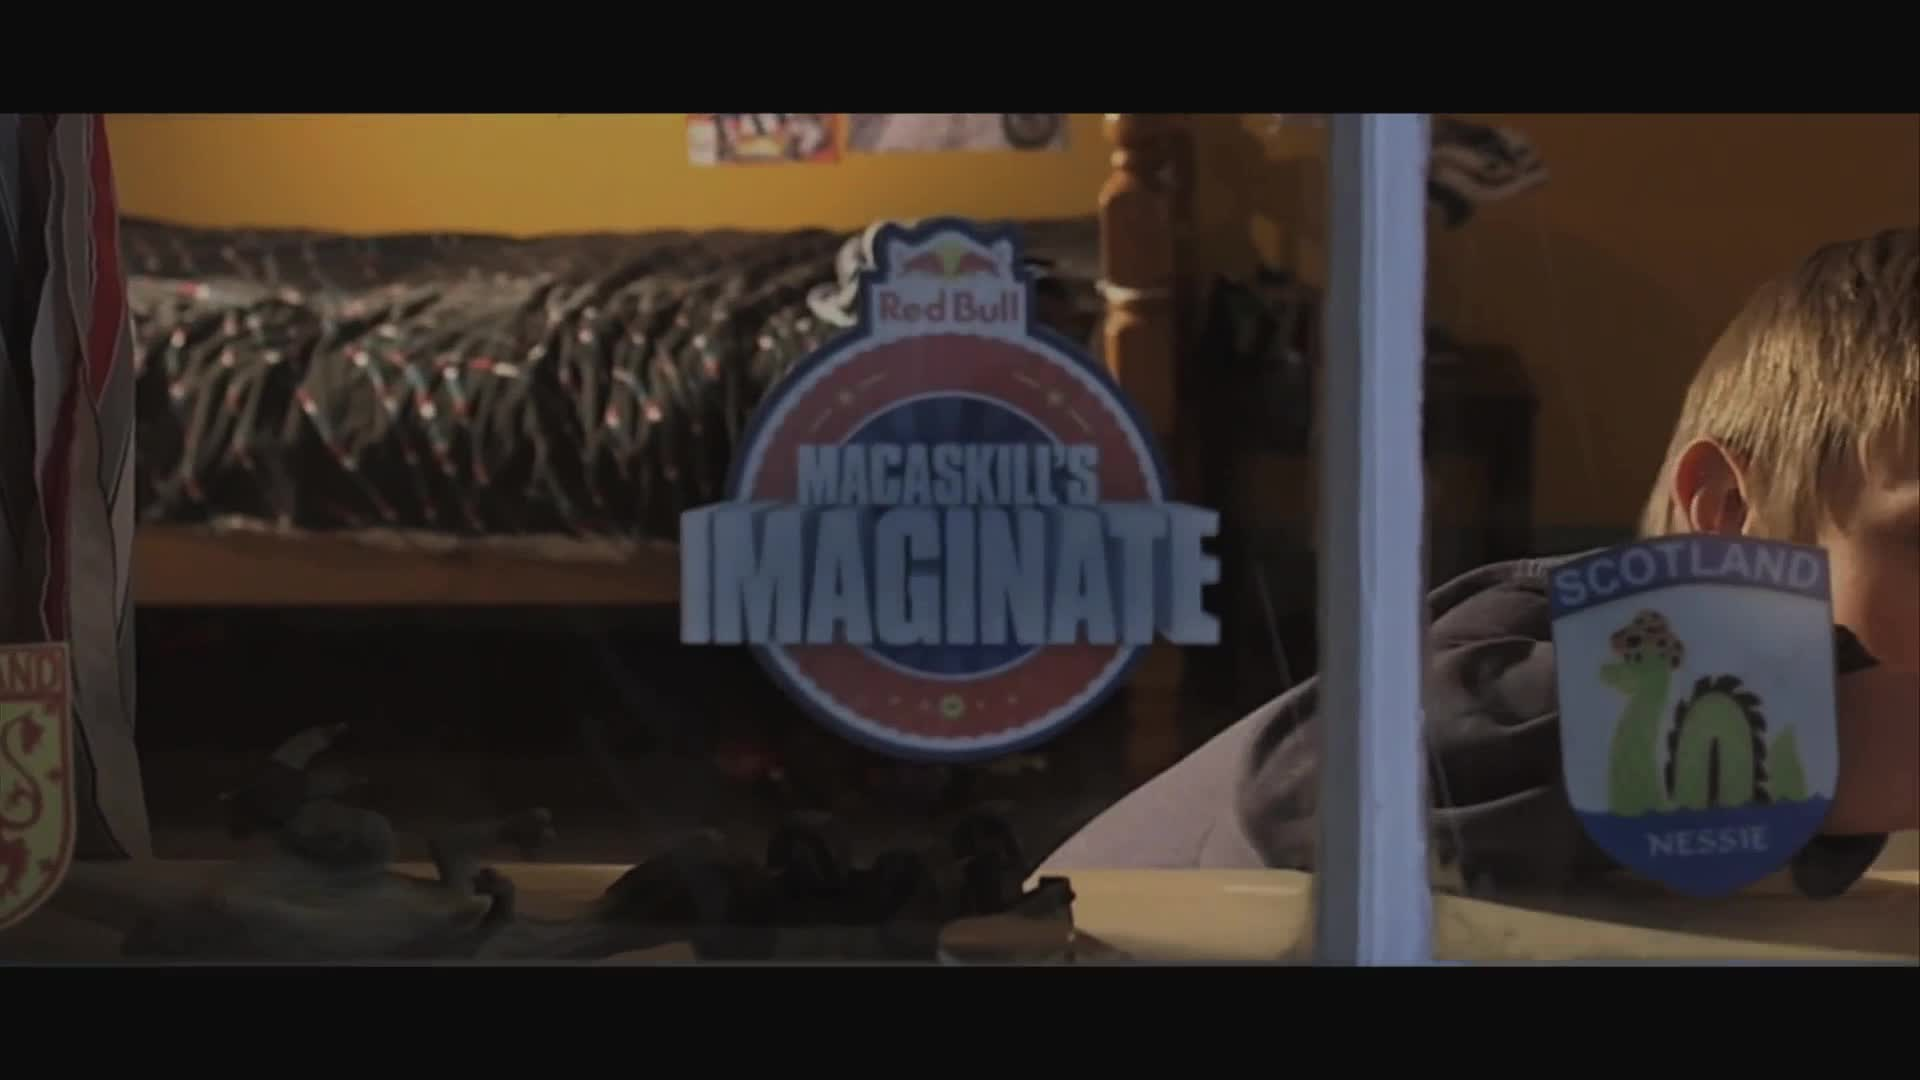 Nominee - Danny MacAskill's Imaginate